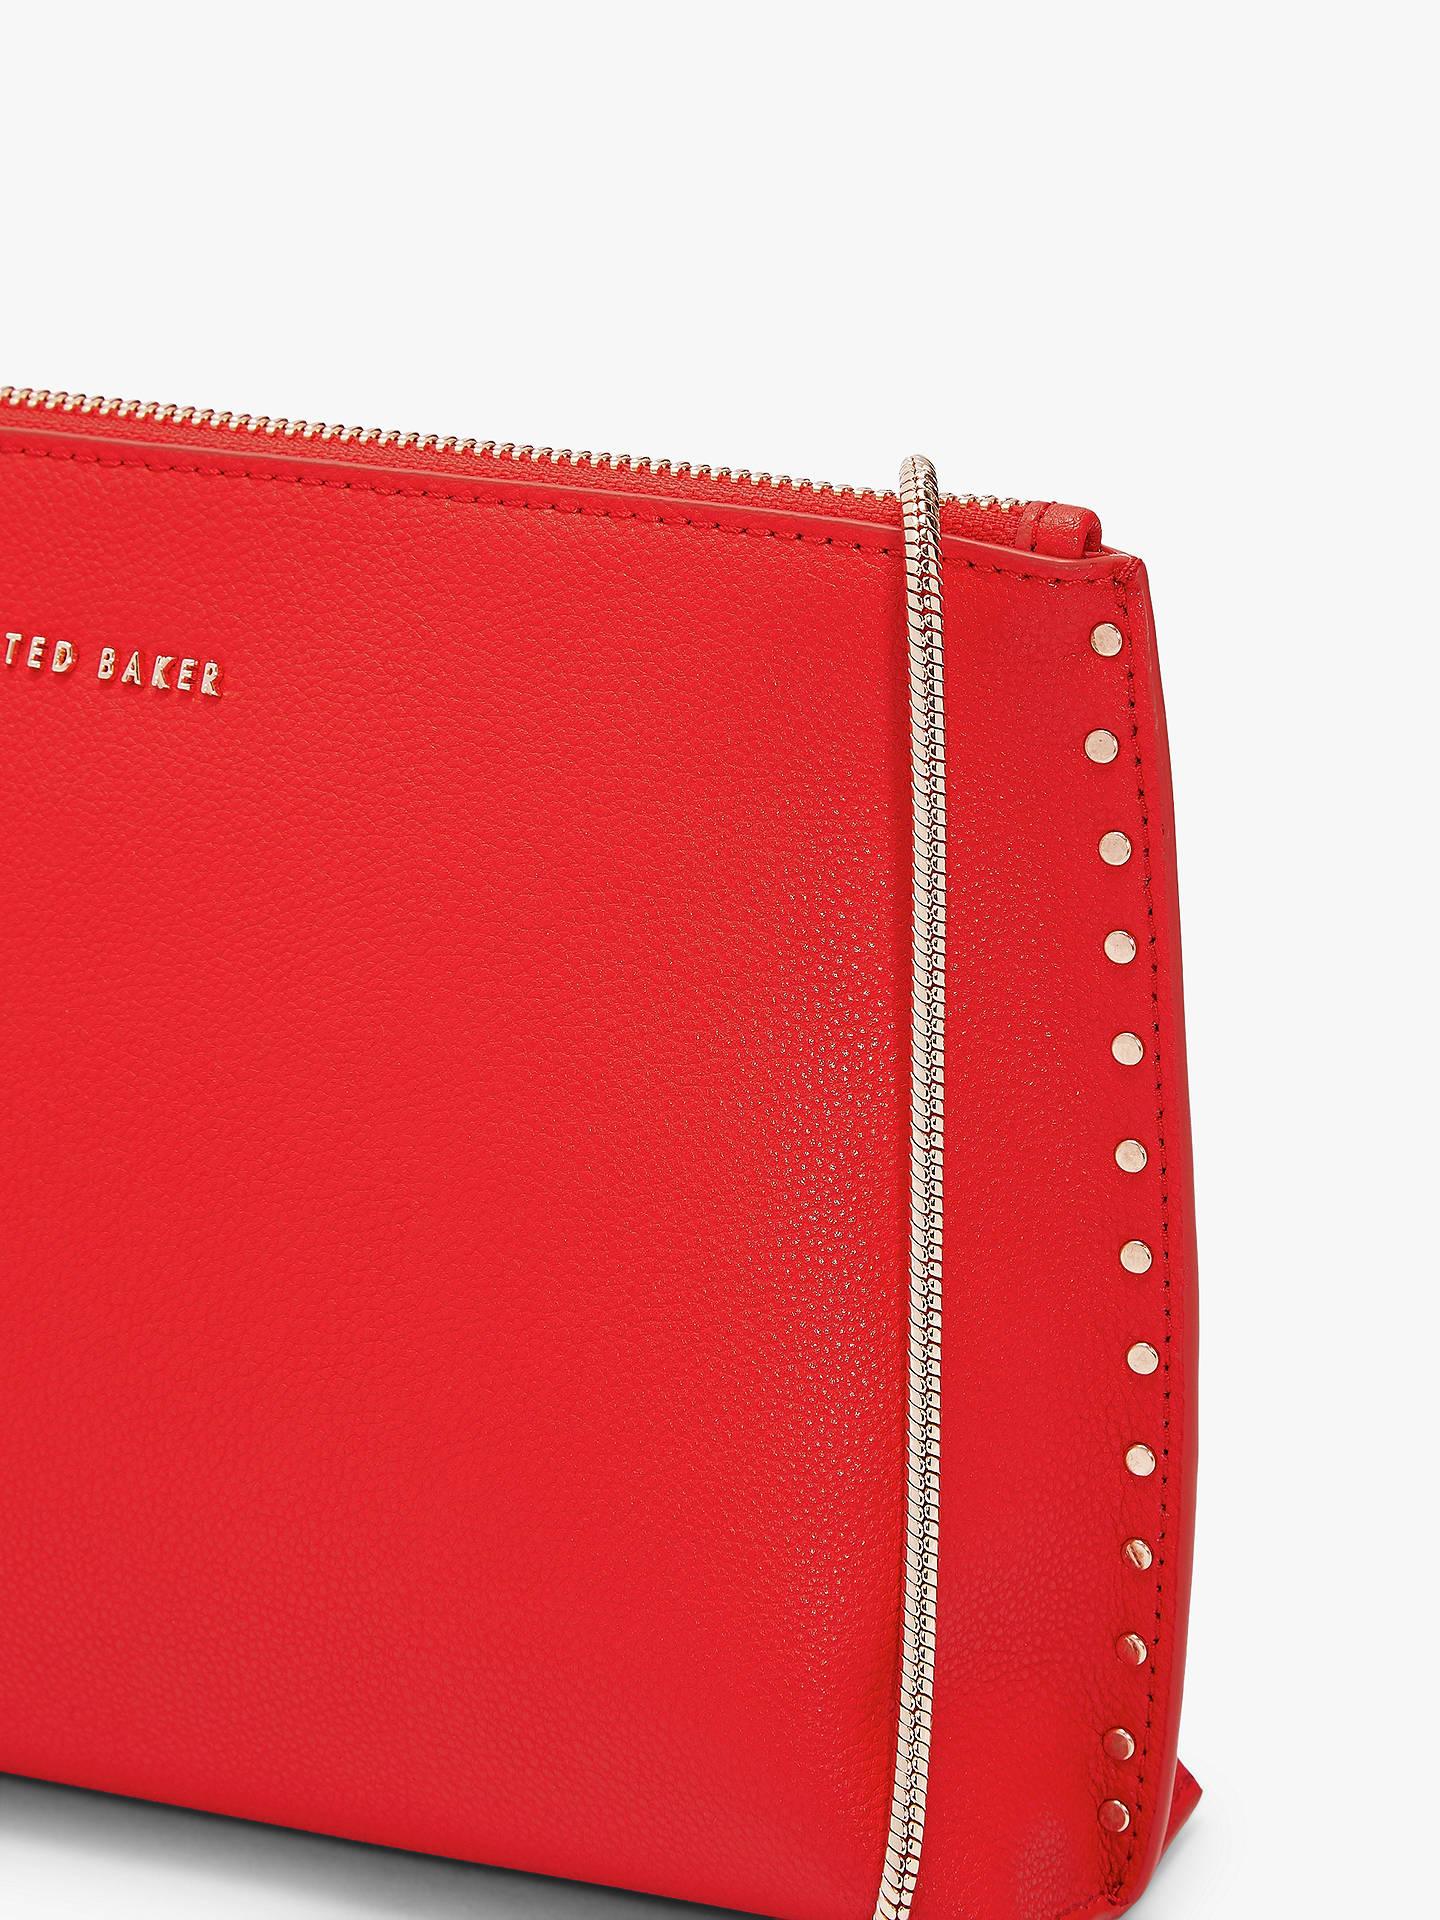 07819c7378 ... Buy Ted Baker Tesssa Leather Evening Bag, Mid Red Online at  johnlewis.com ...